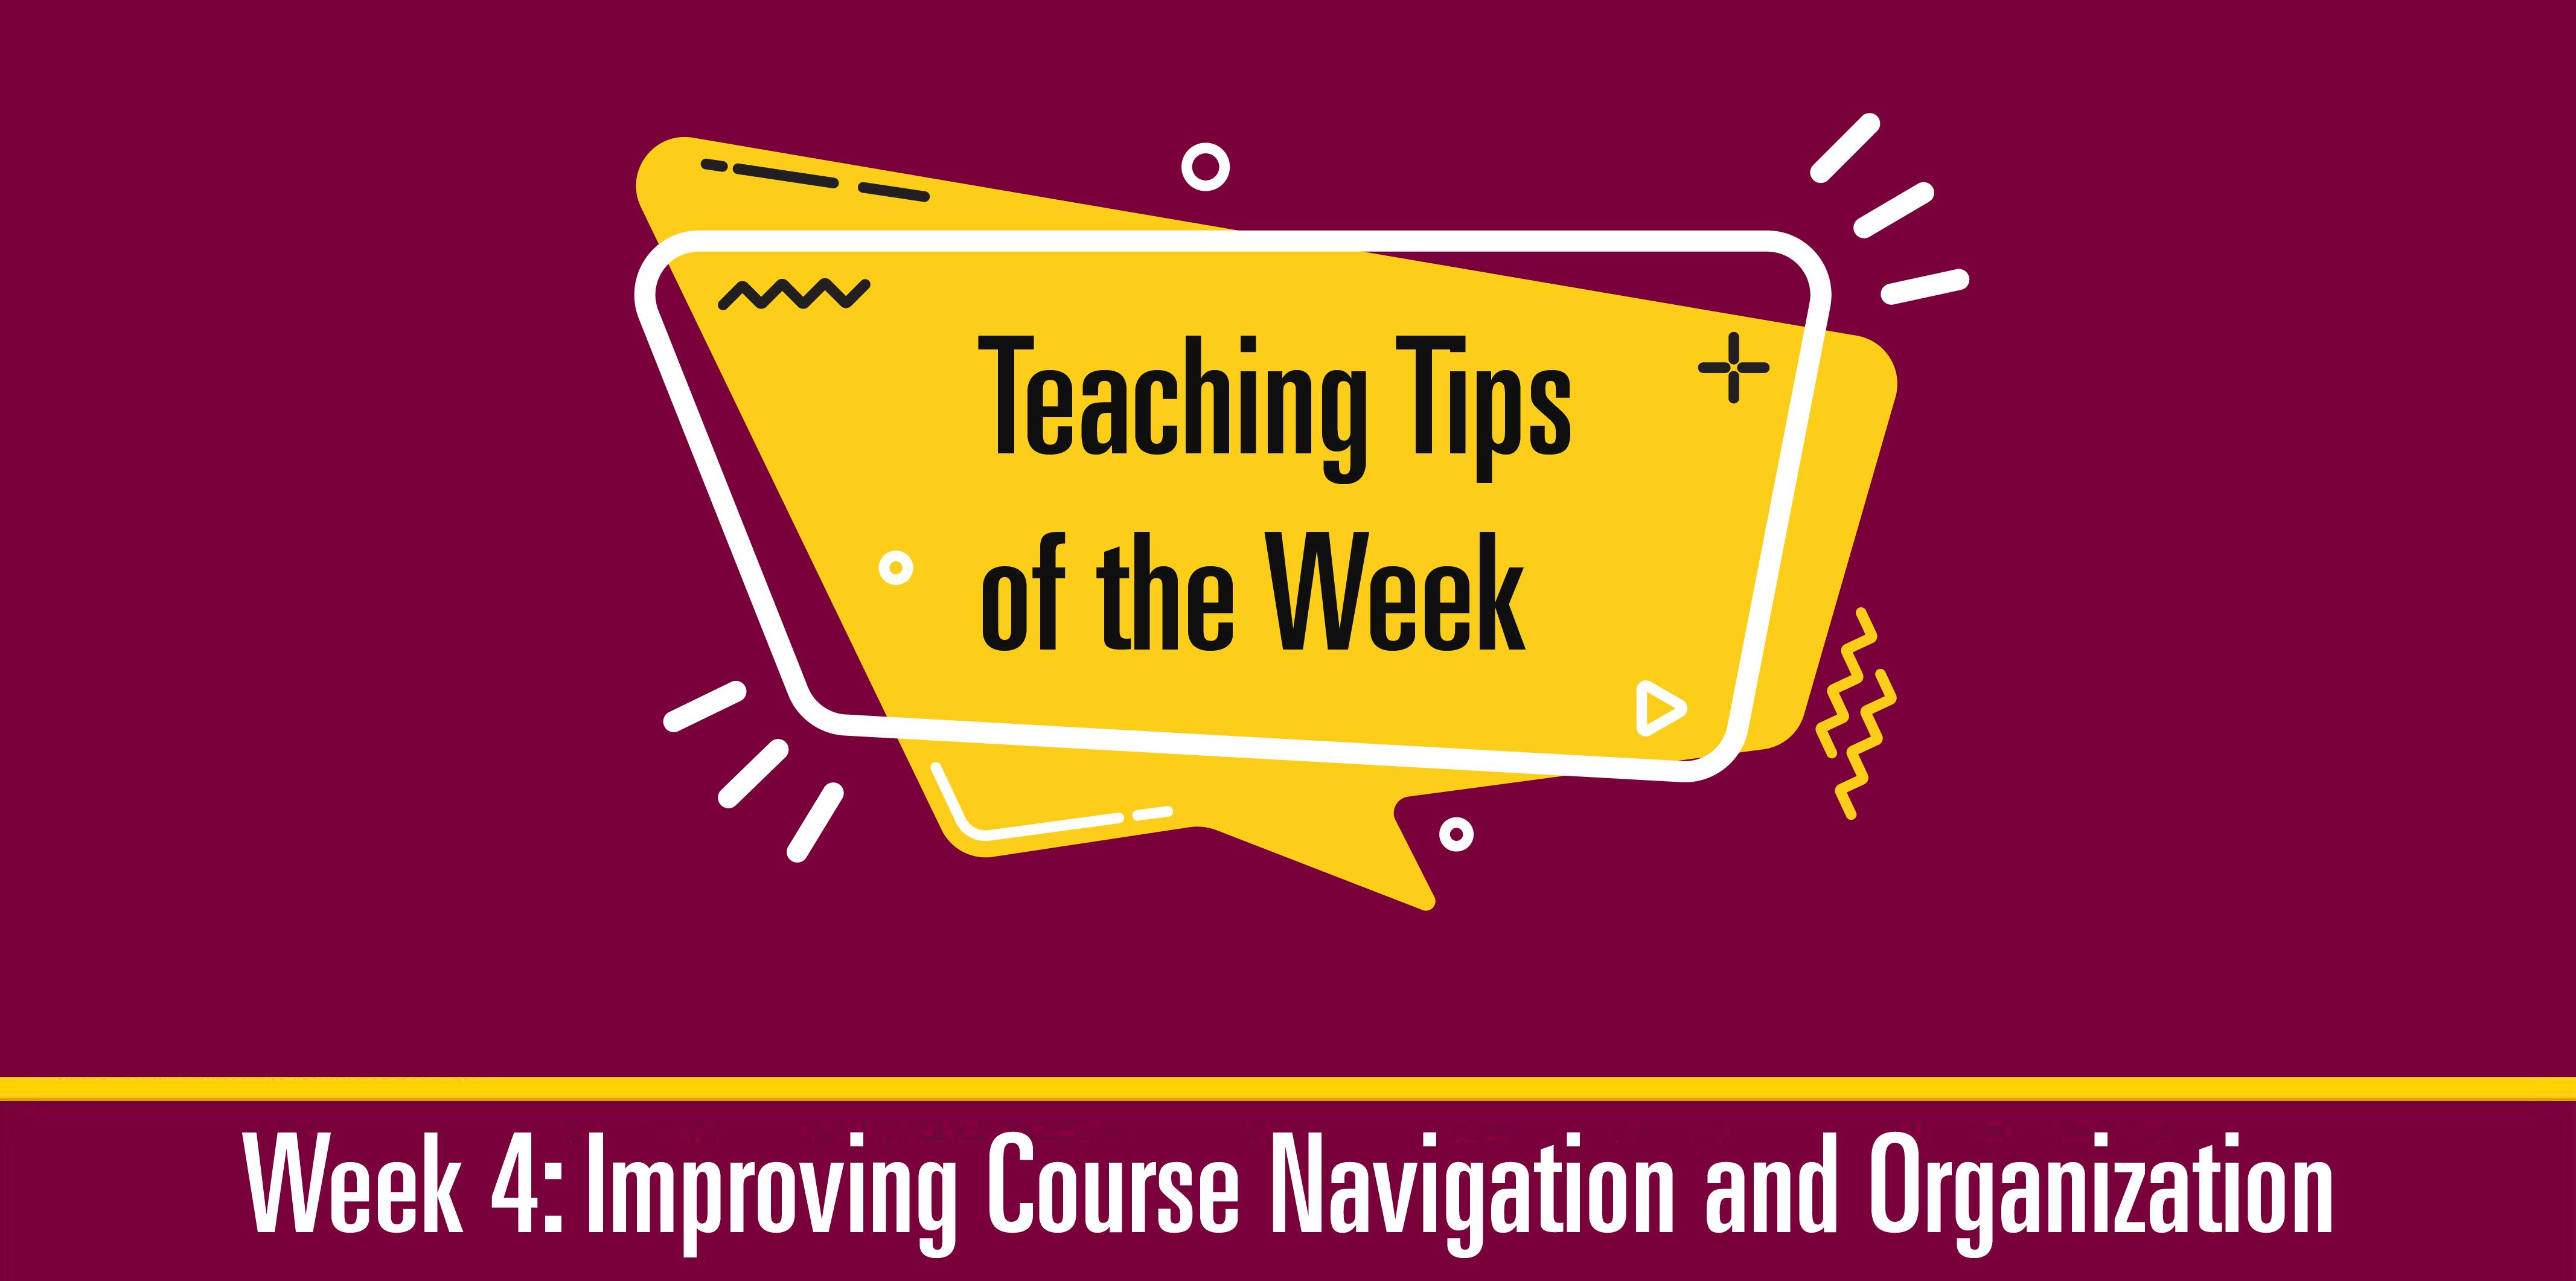 Teaching Tips 4